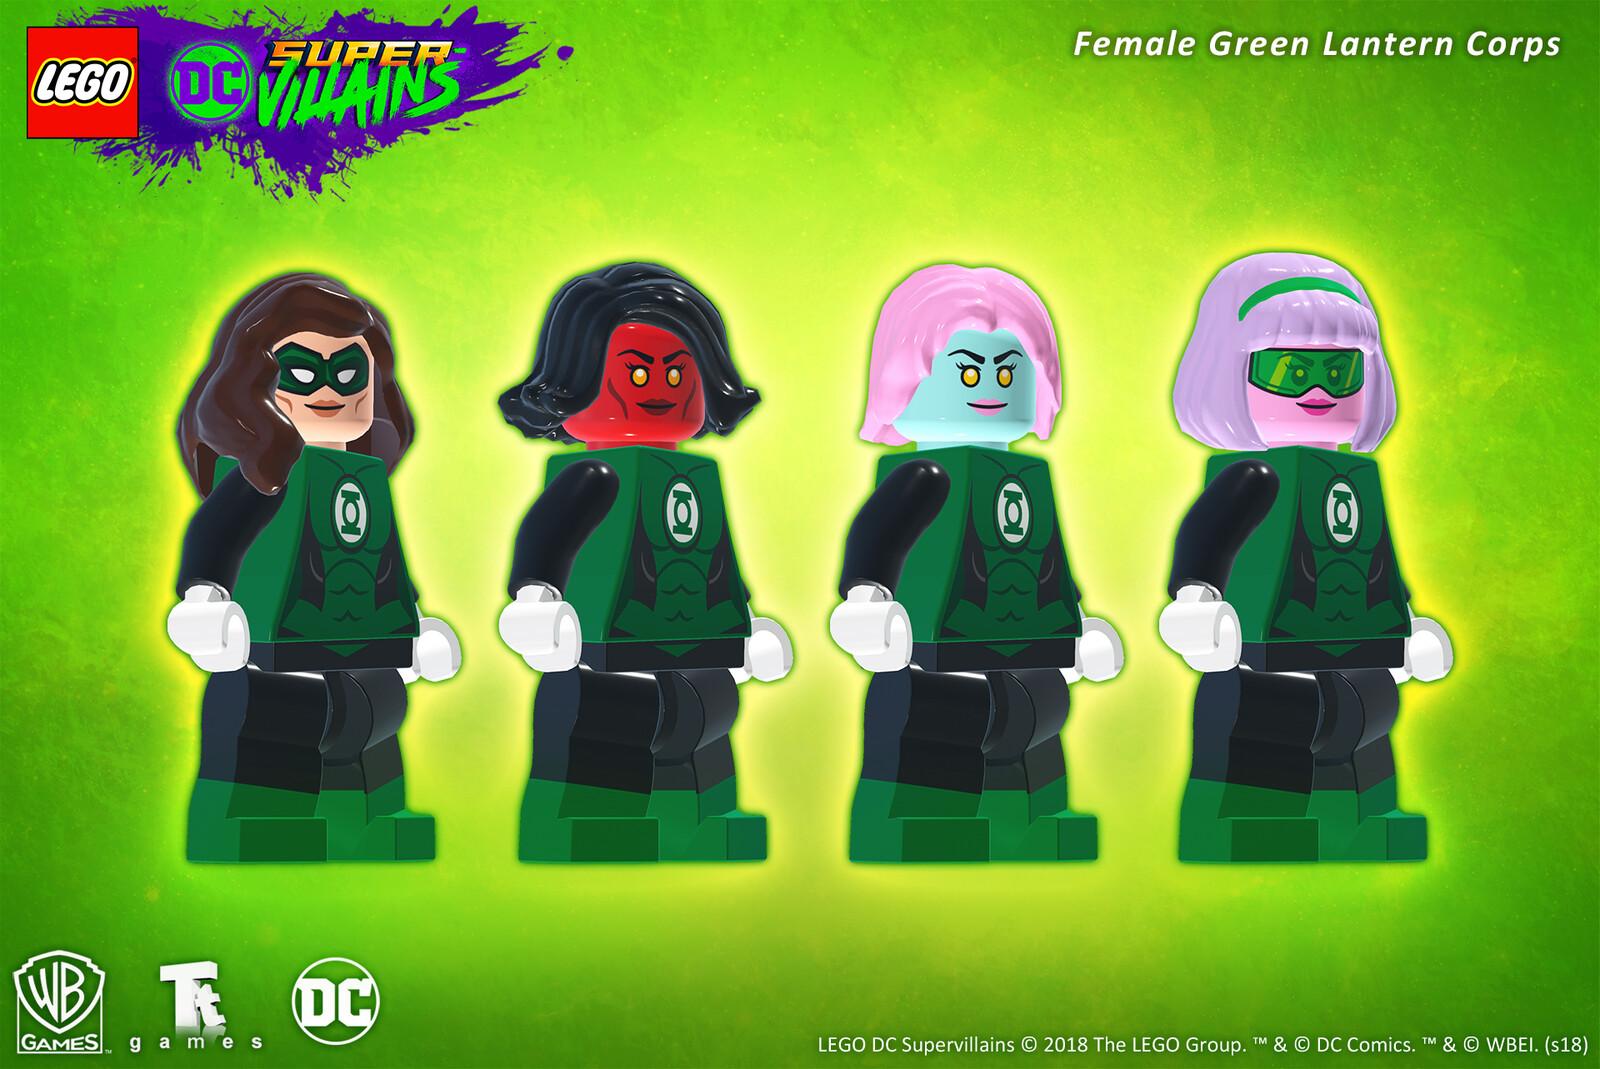 Female Green Lantern Corps